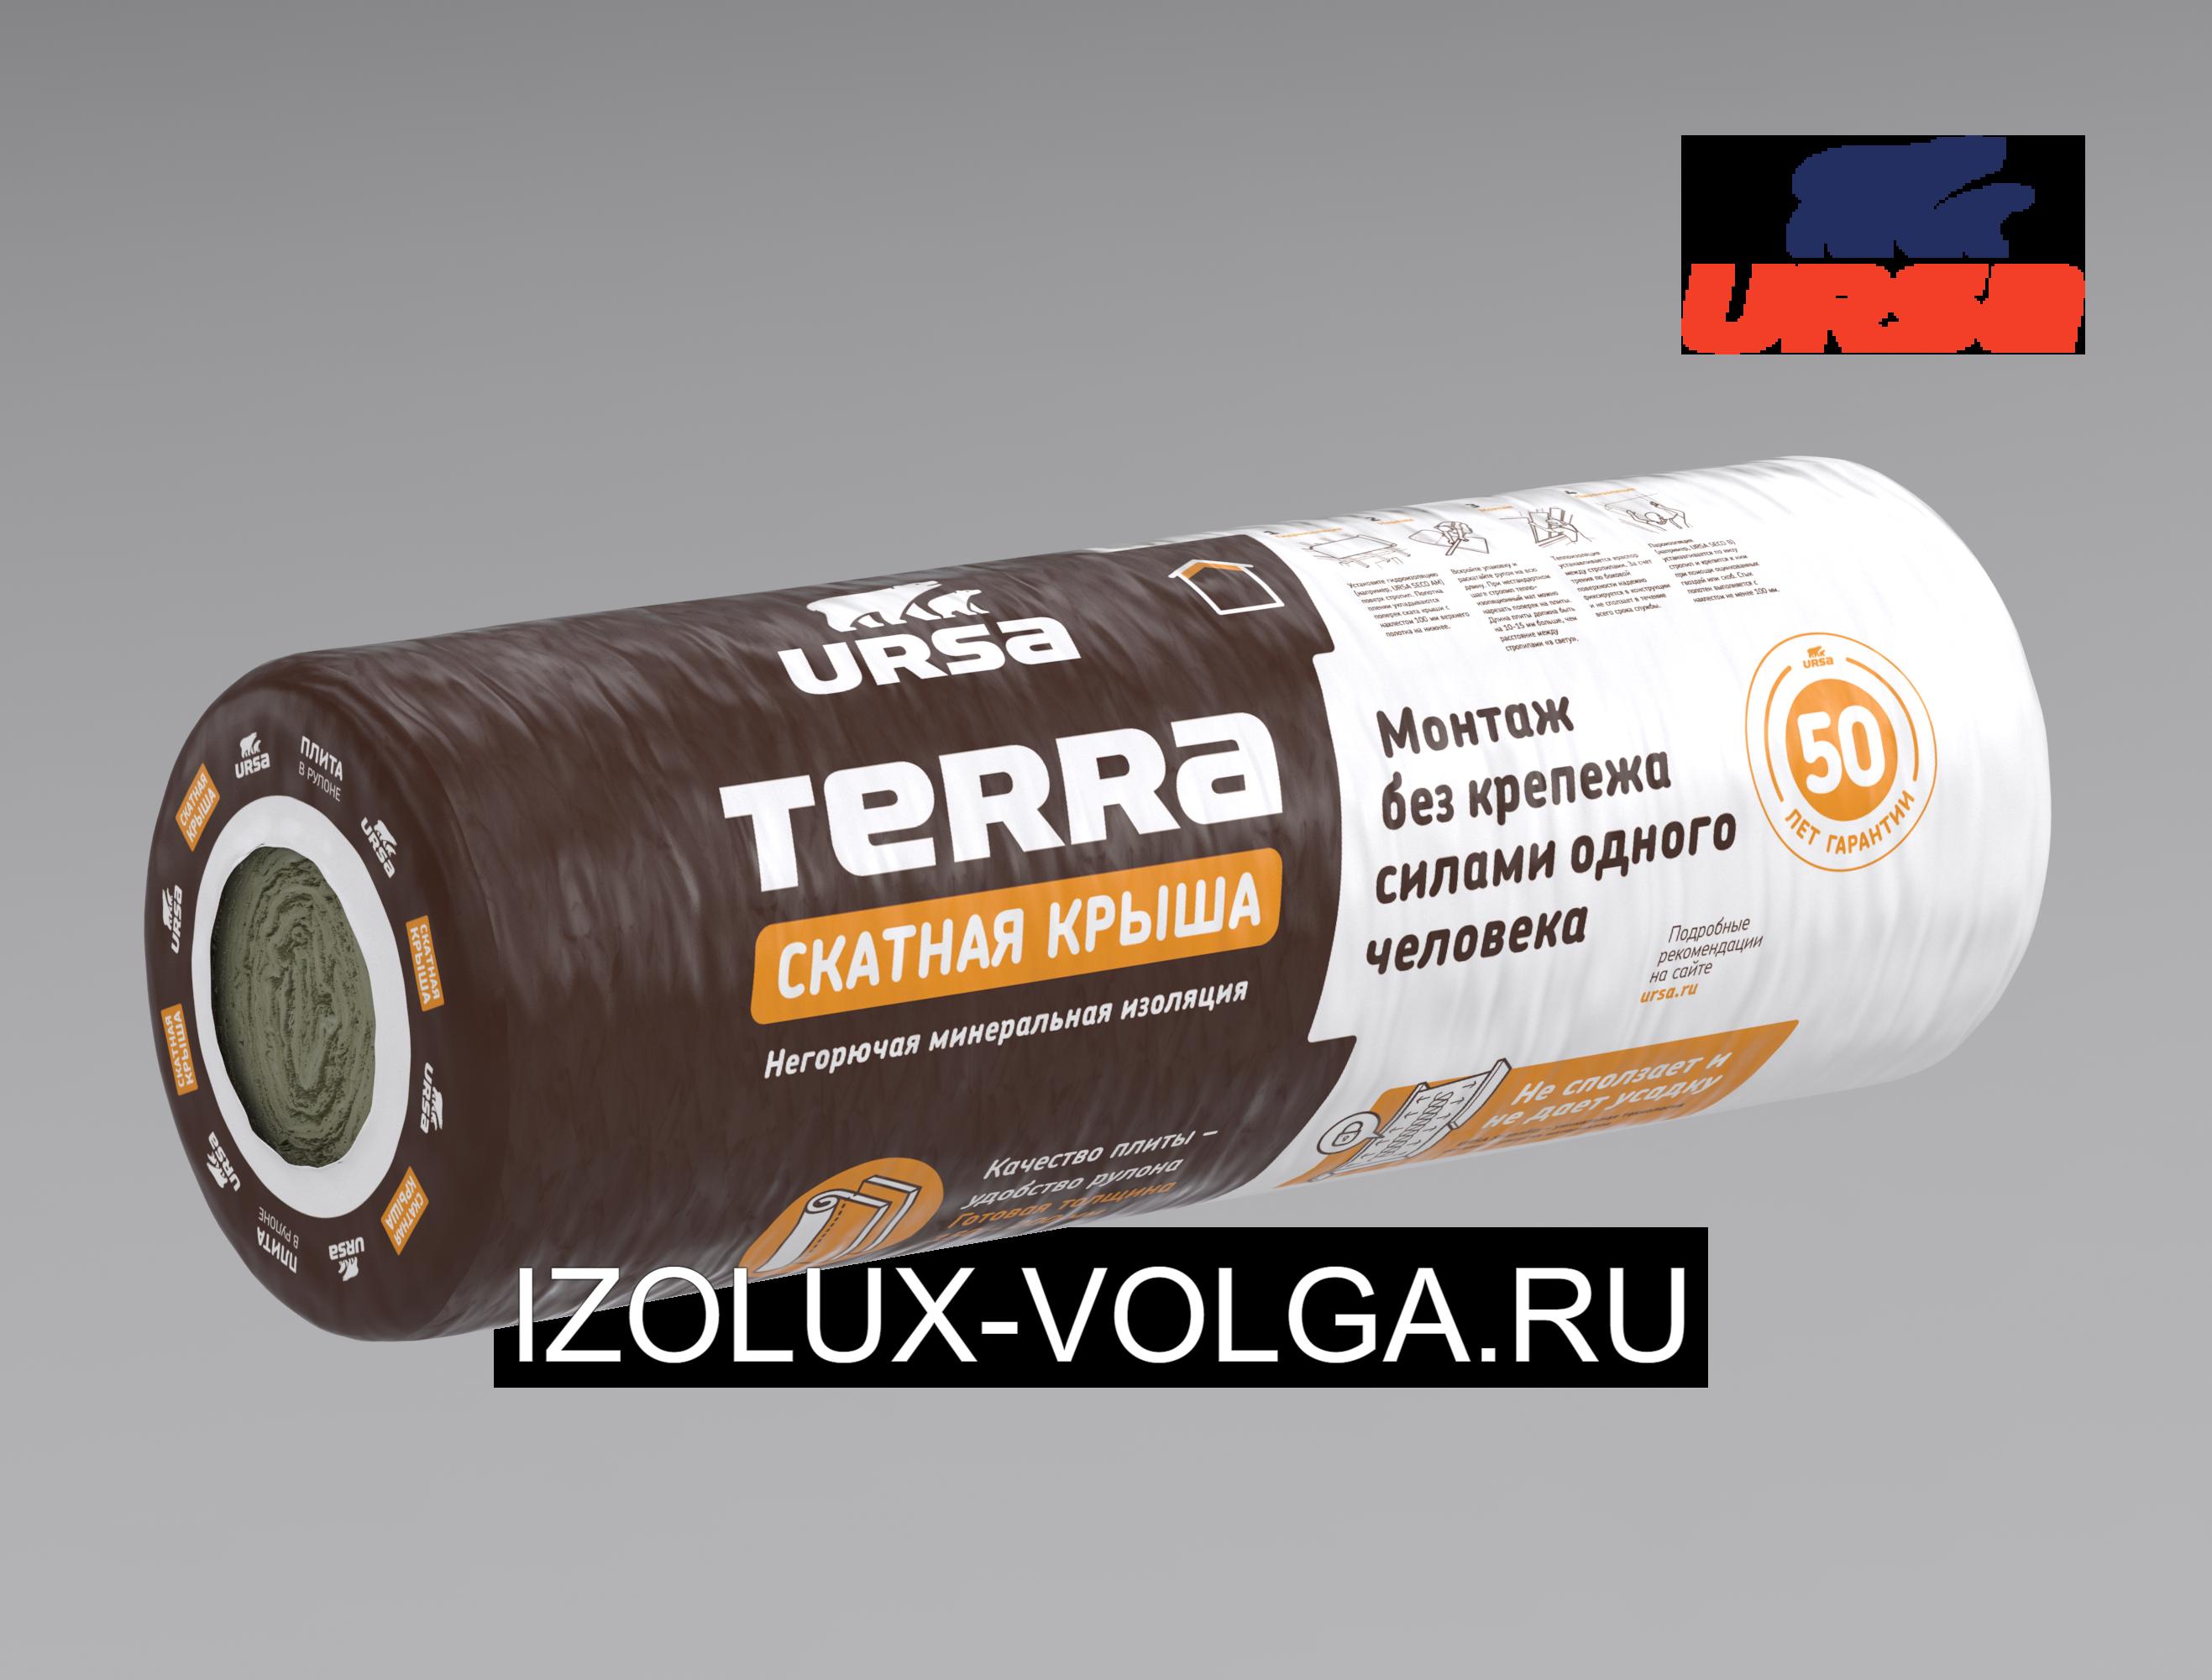 URSA TERRA Скатная крыша 35 QN 3900x1200x150 4,68 м2